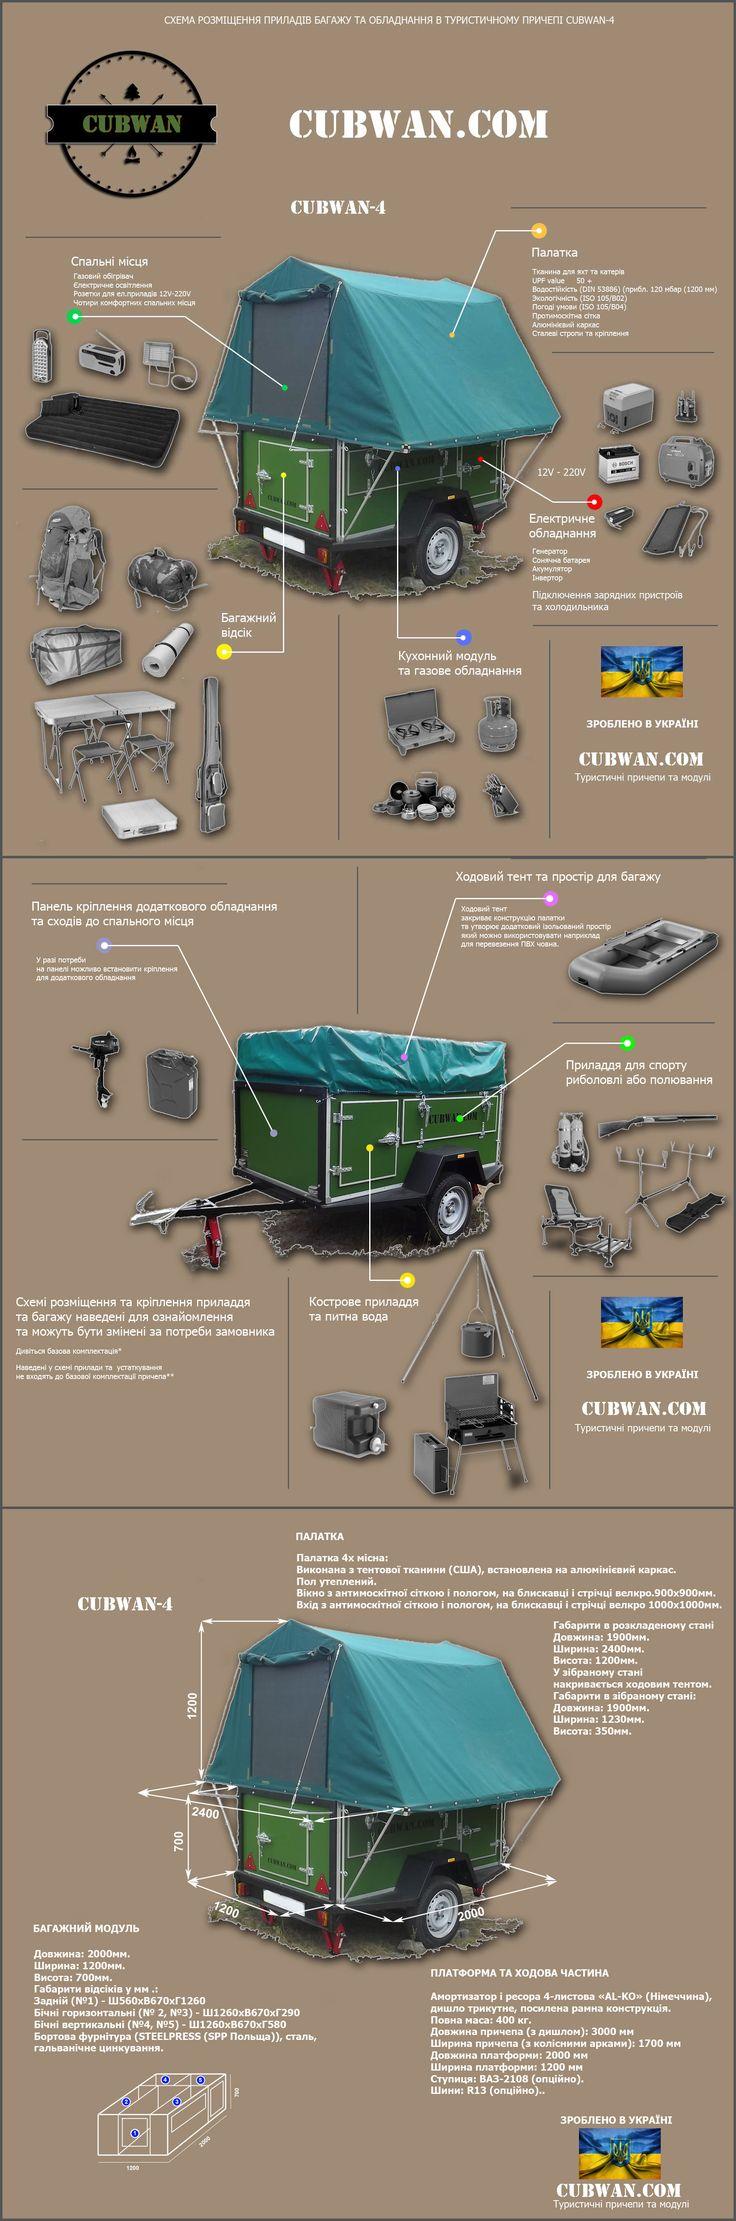 Camping Trailer CUBWAN #trailer-tent #travel-trailer #trailer-camping…